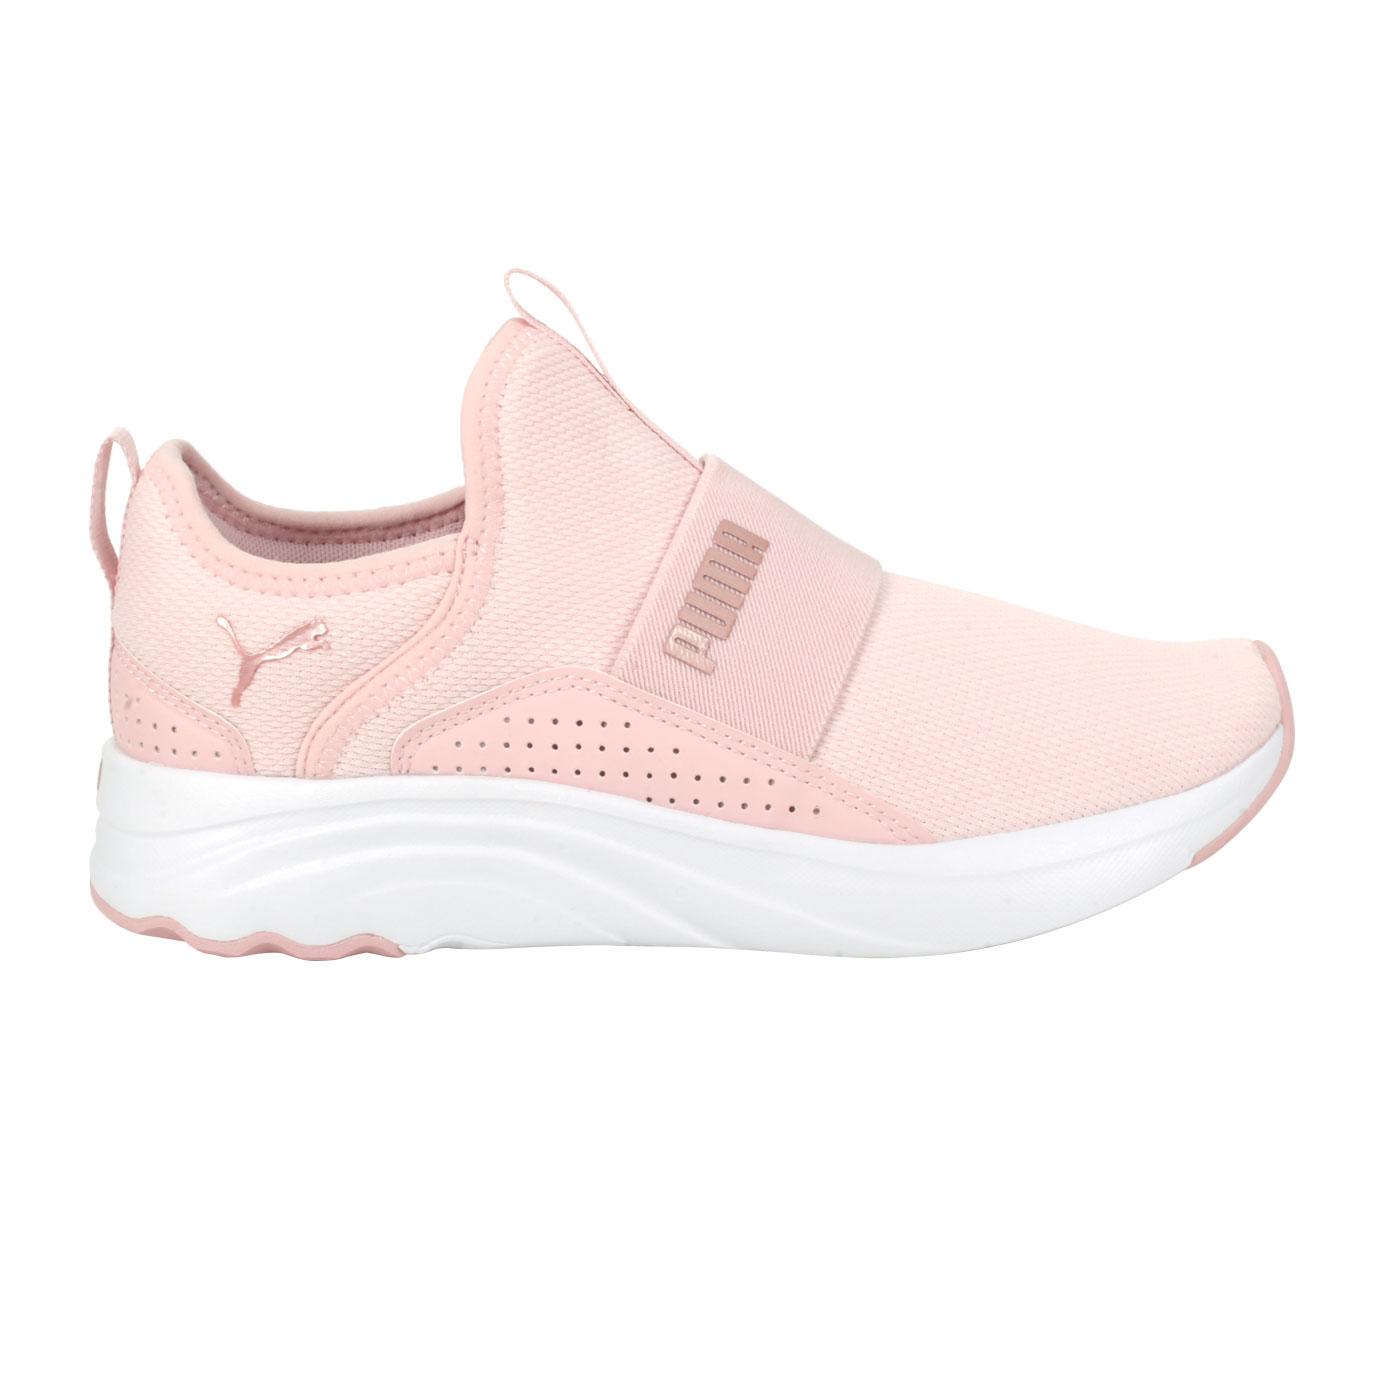 PUMA 女款休閒運動鞋  @Softride Sophia Slip-On Wn's@19516103